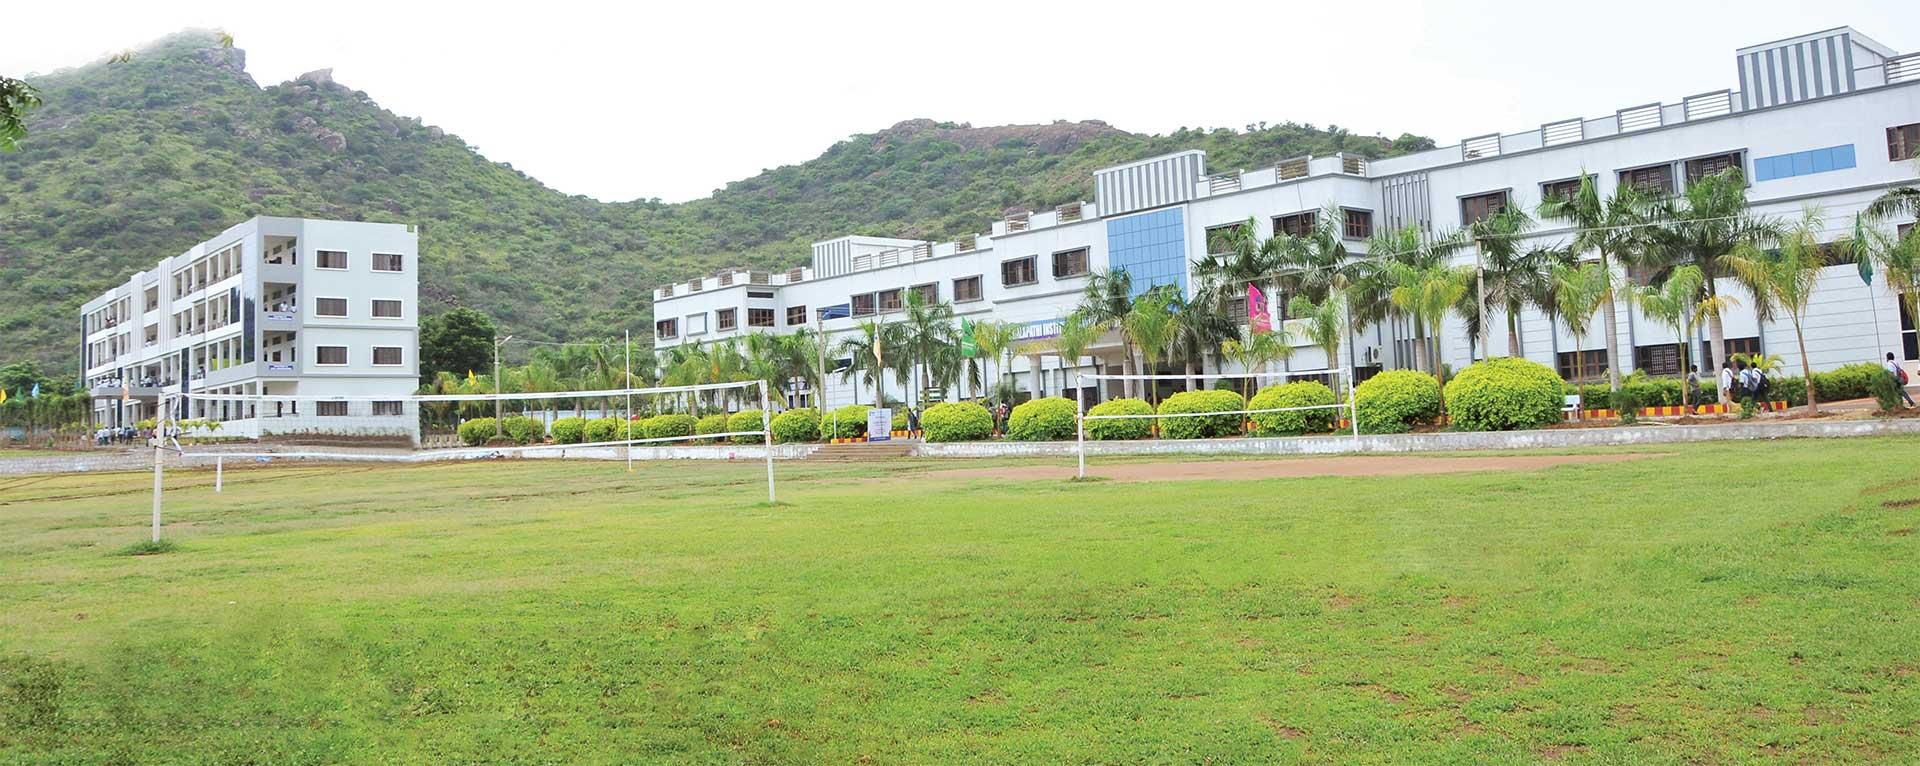 Chalapathi Institute of Technology, Guntur